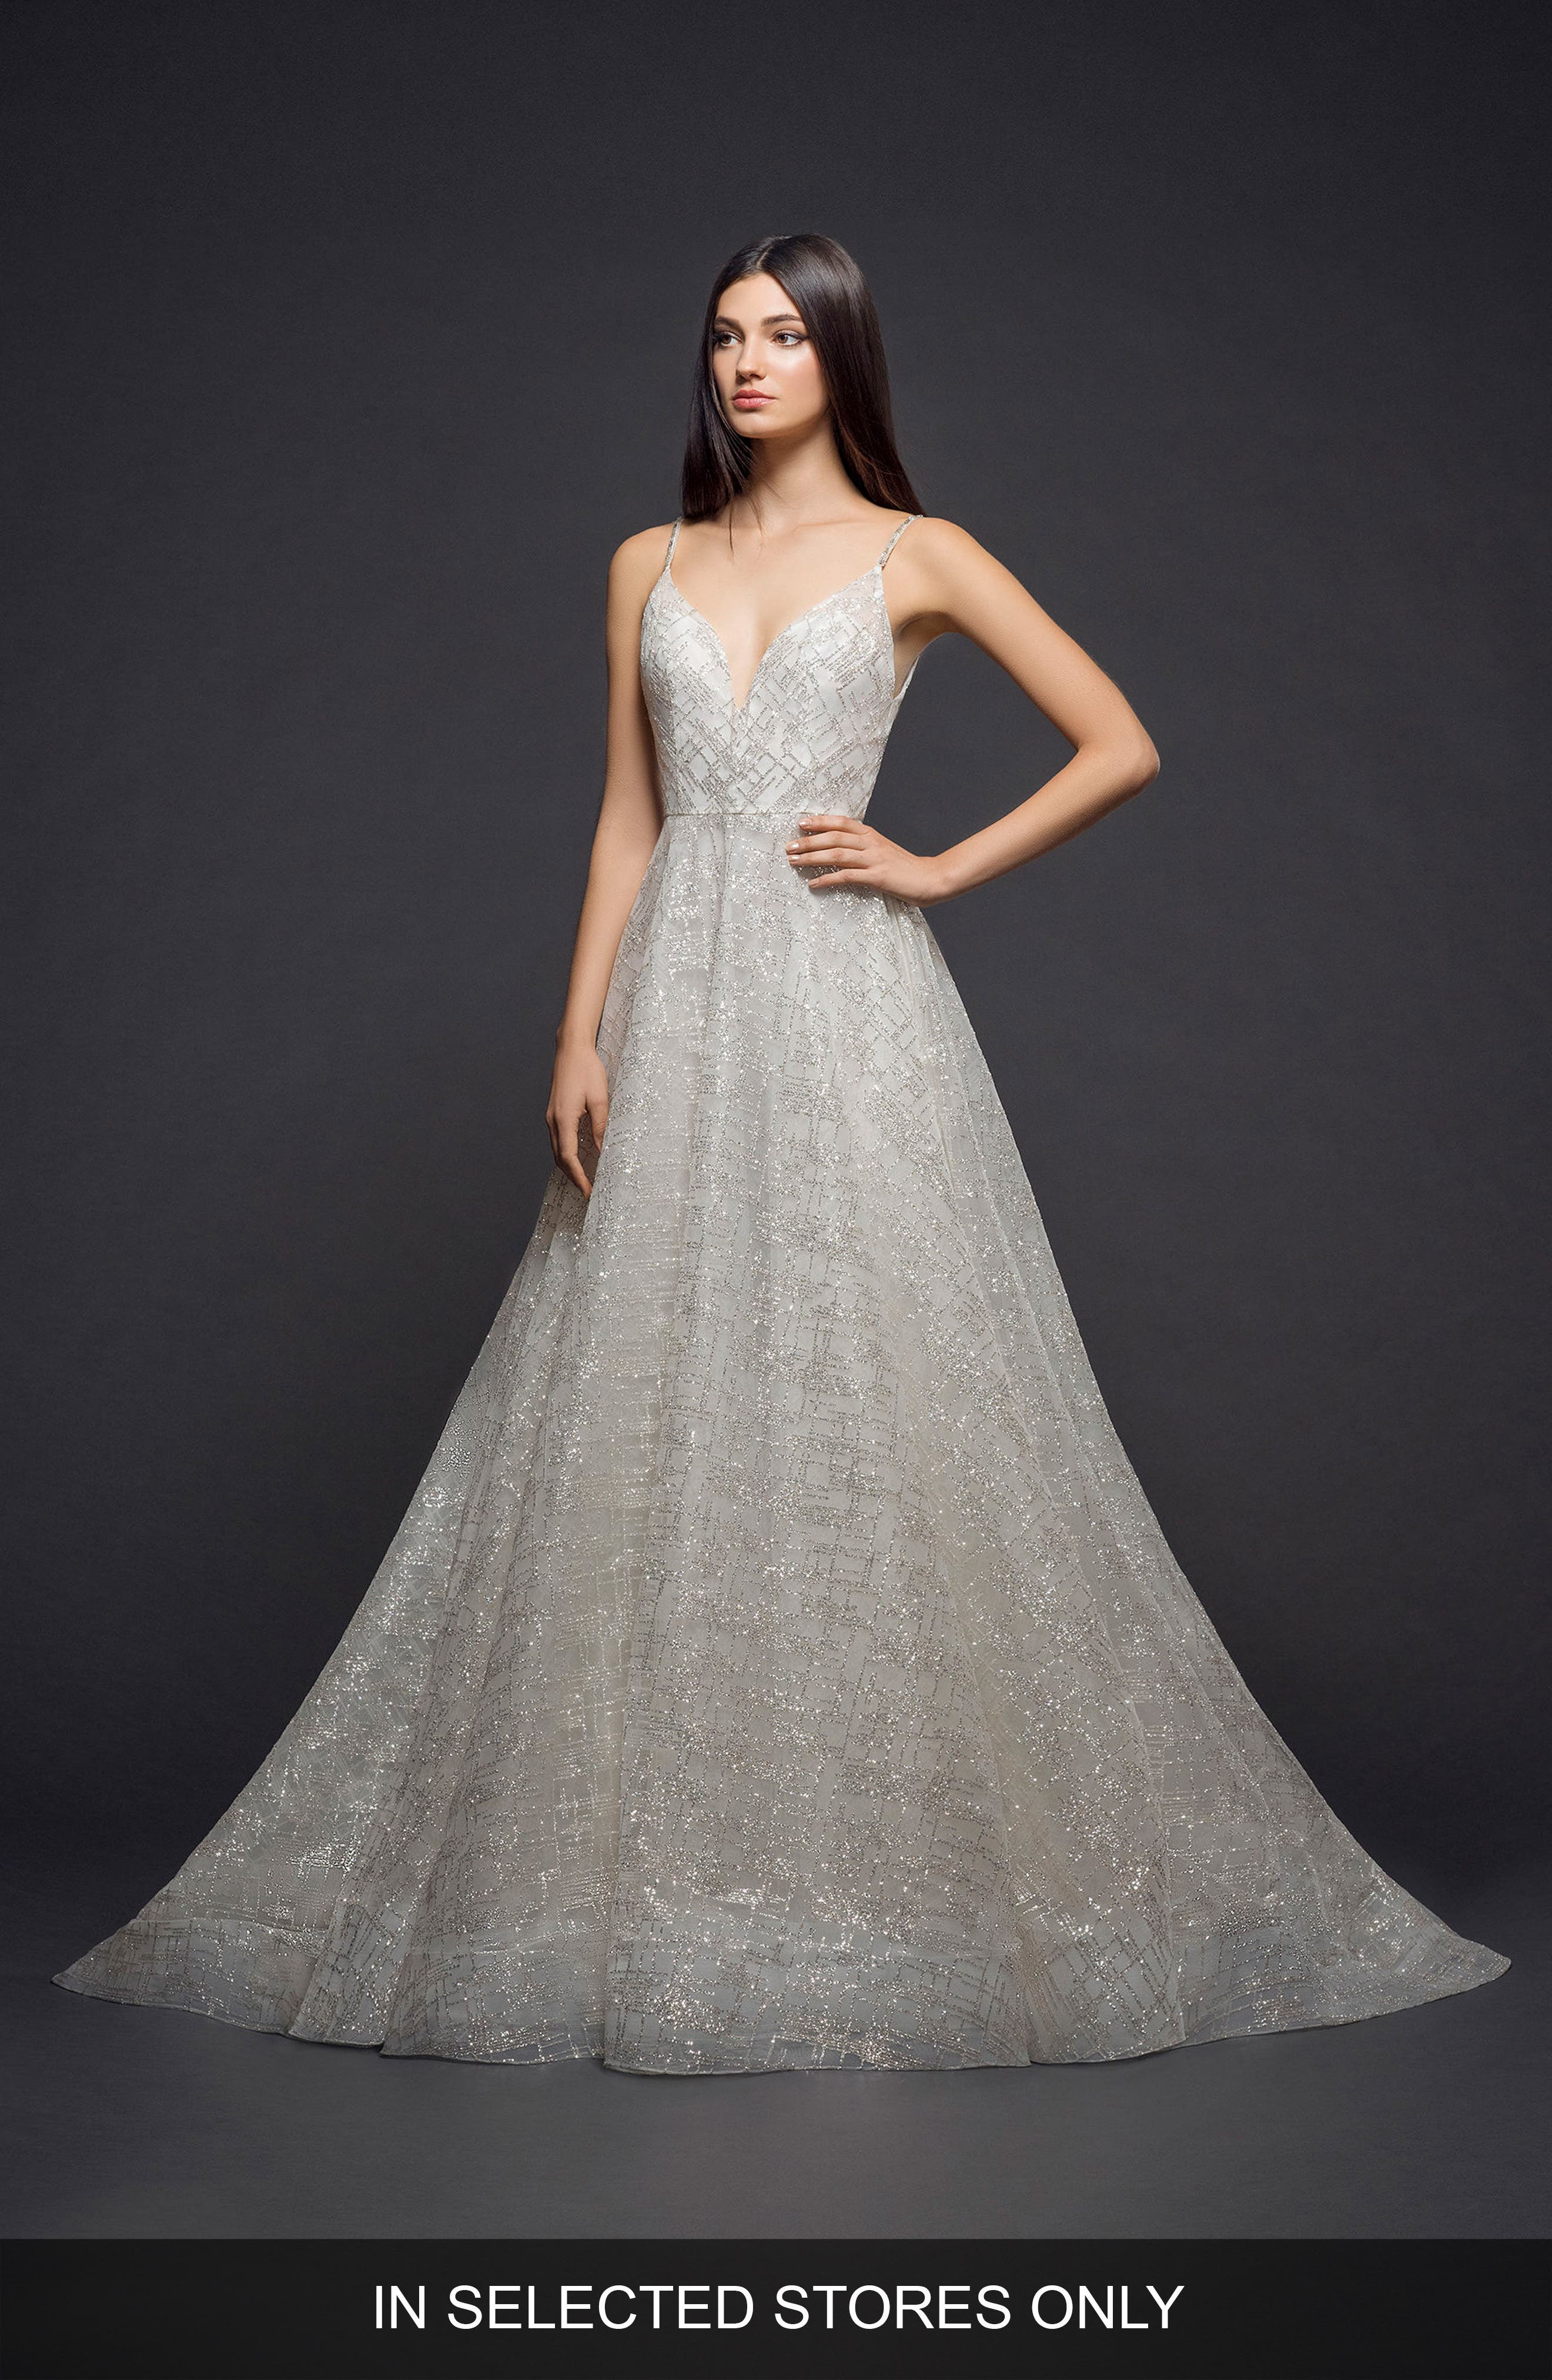 Sparkle Plaid Tulle A-Line Gown,                         Main,                         color, IVORY